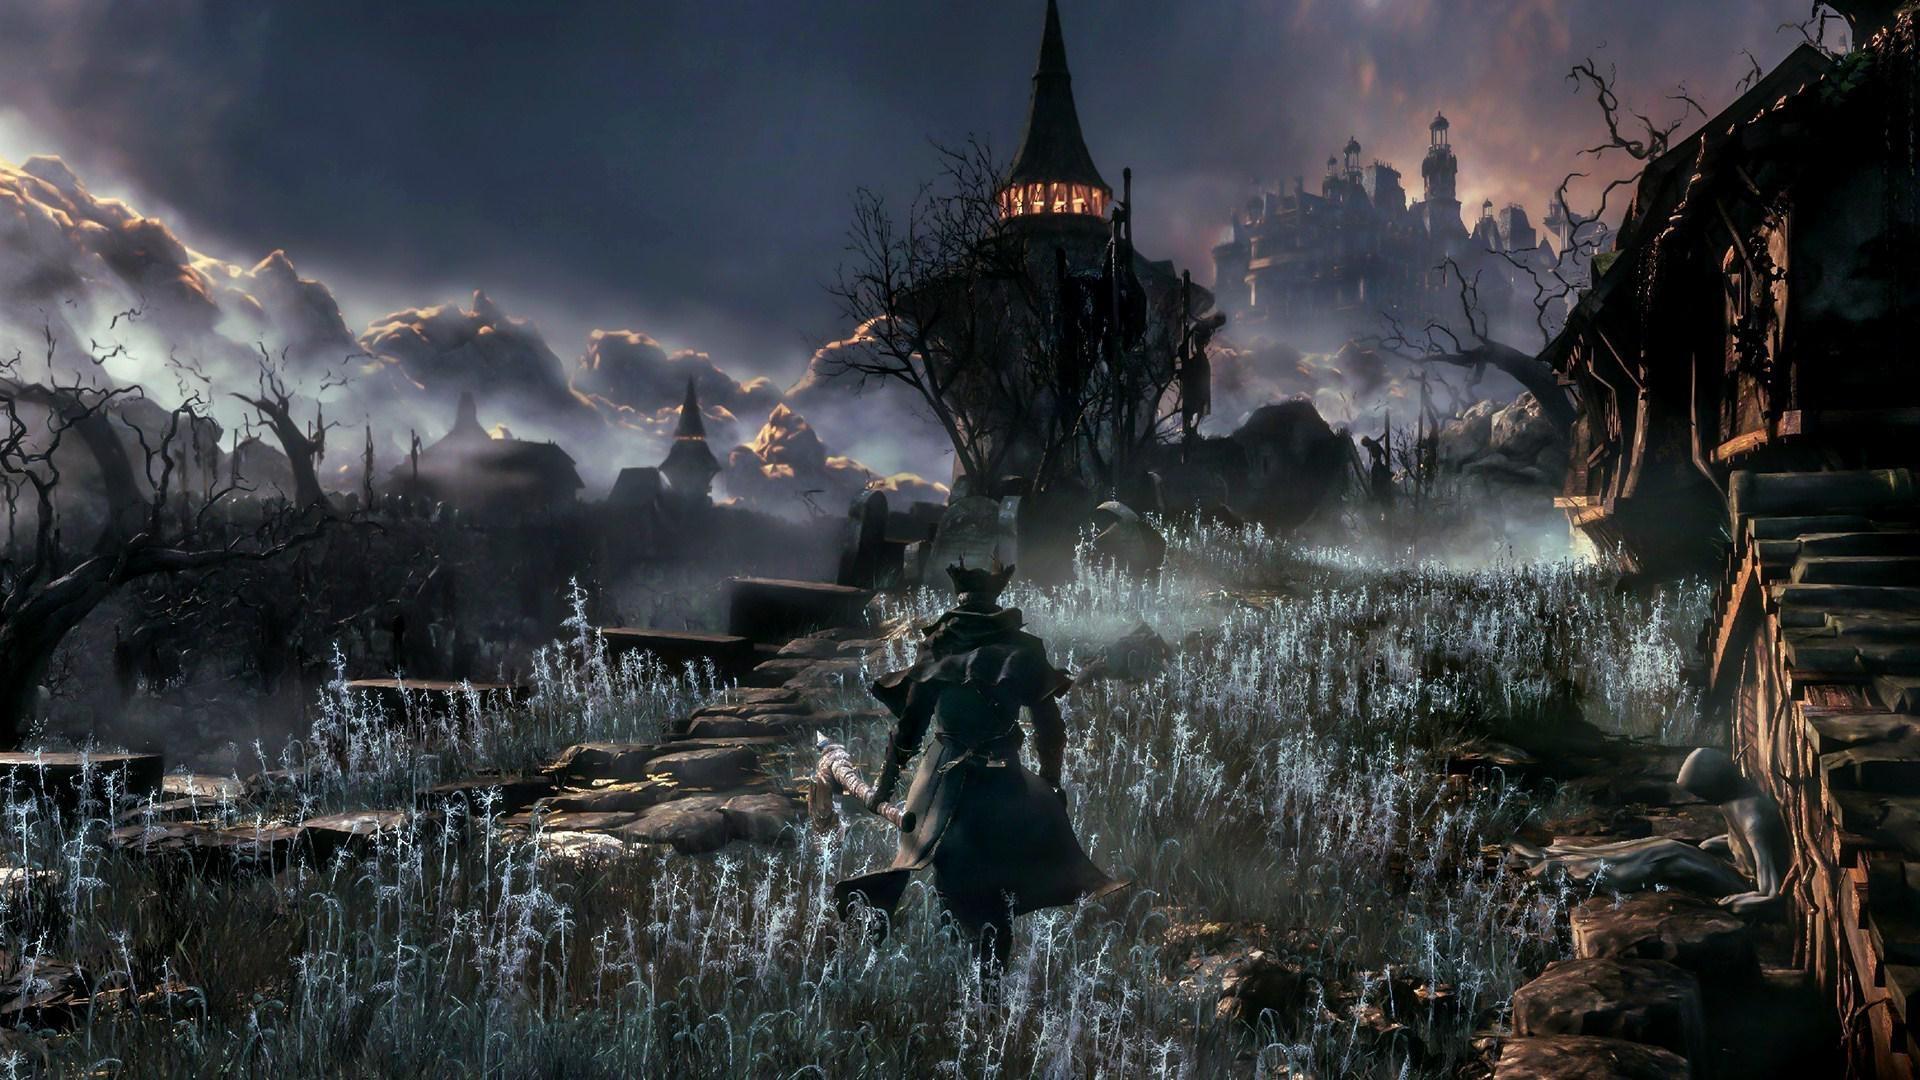 dark souls 3에 대한 이미지 검색결과 | Dark Souls | Pinterest | Dark souls